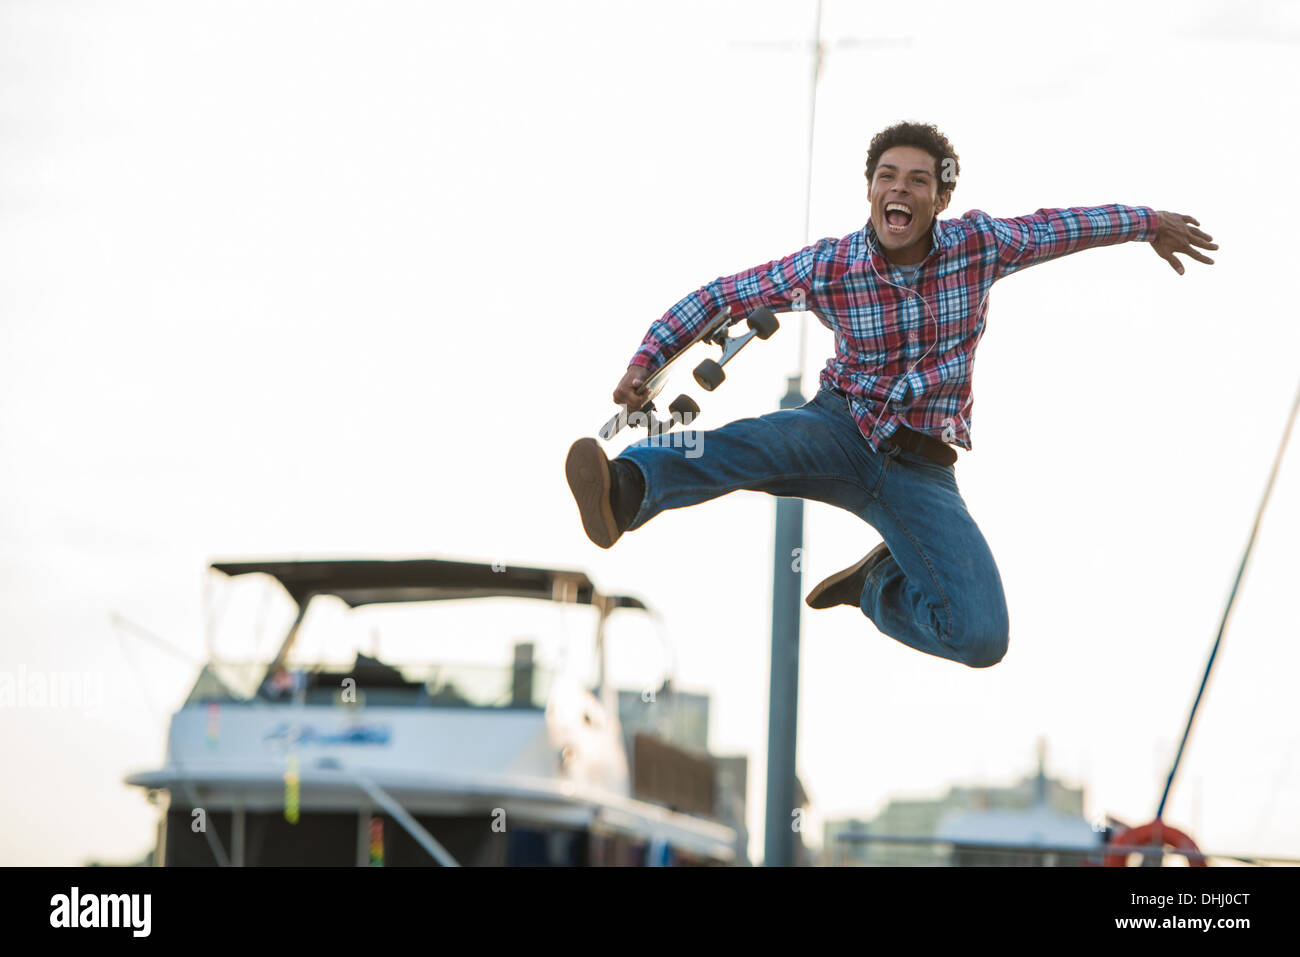 Sautant de joie Skateboarder Photo Stock